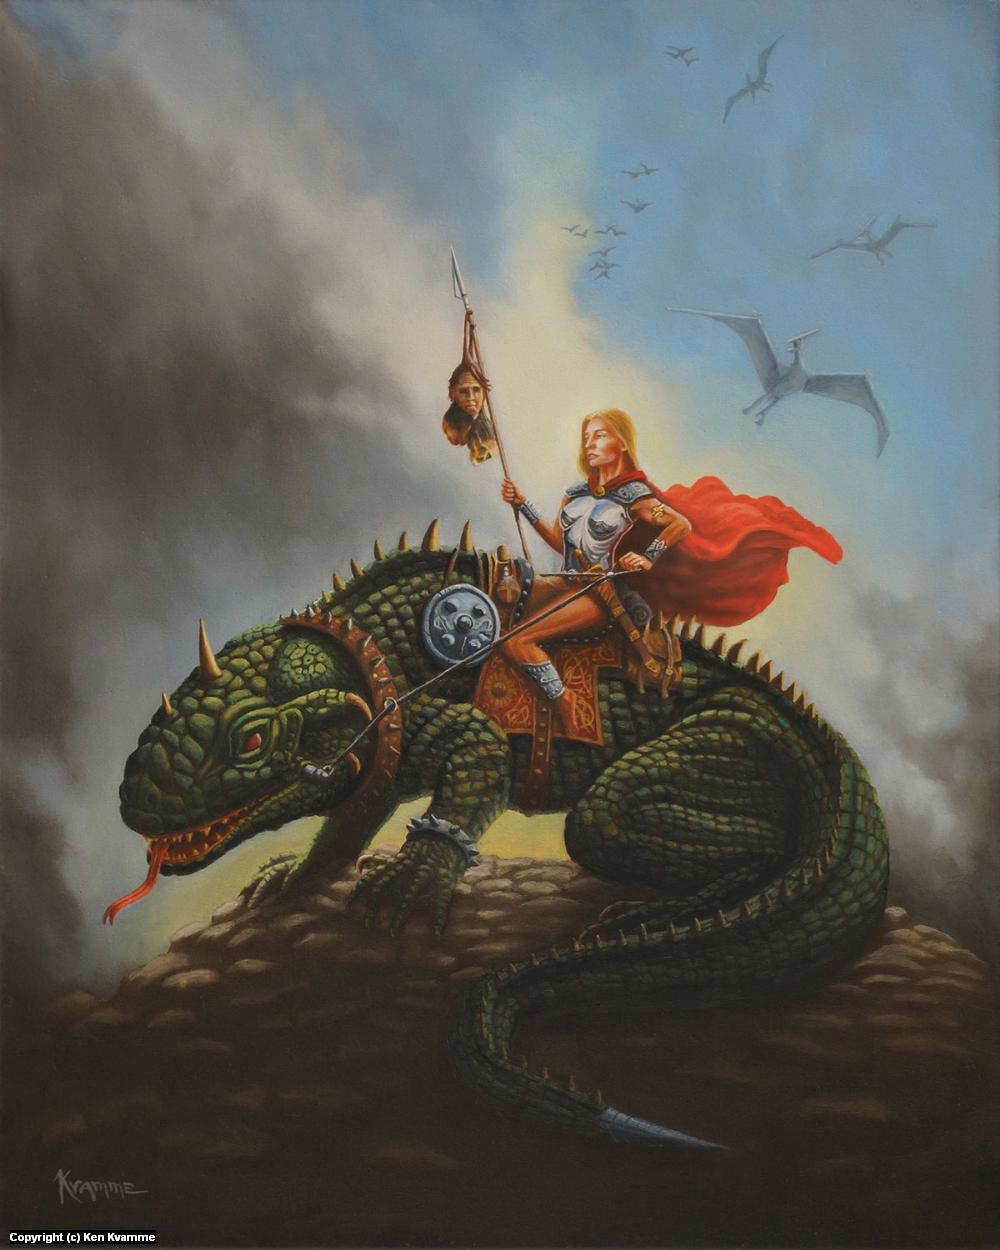 The Dragon Rider Artwork by Ken Kvamme